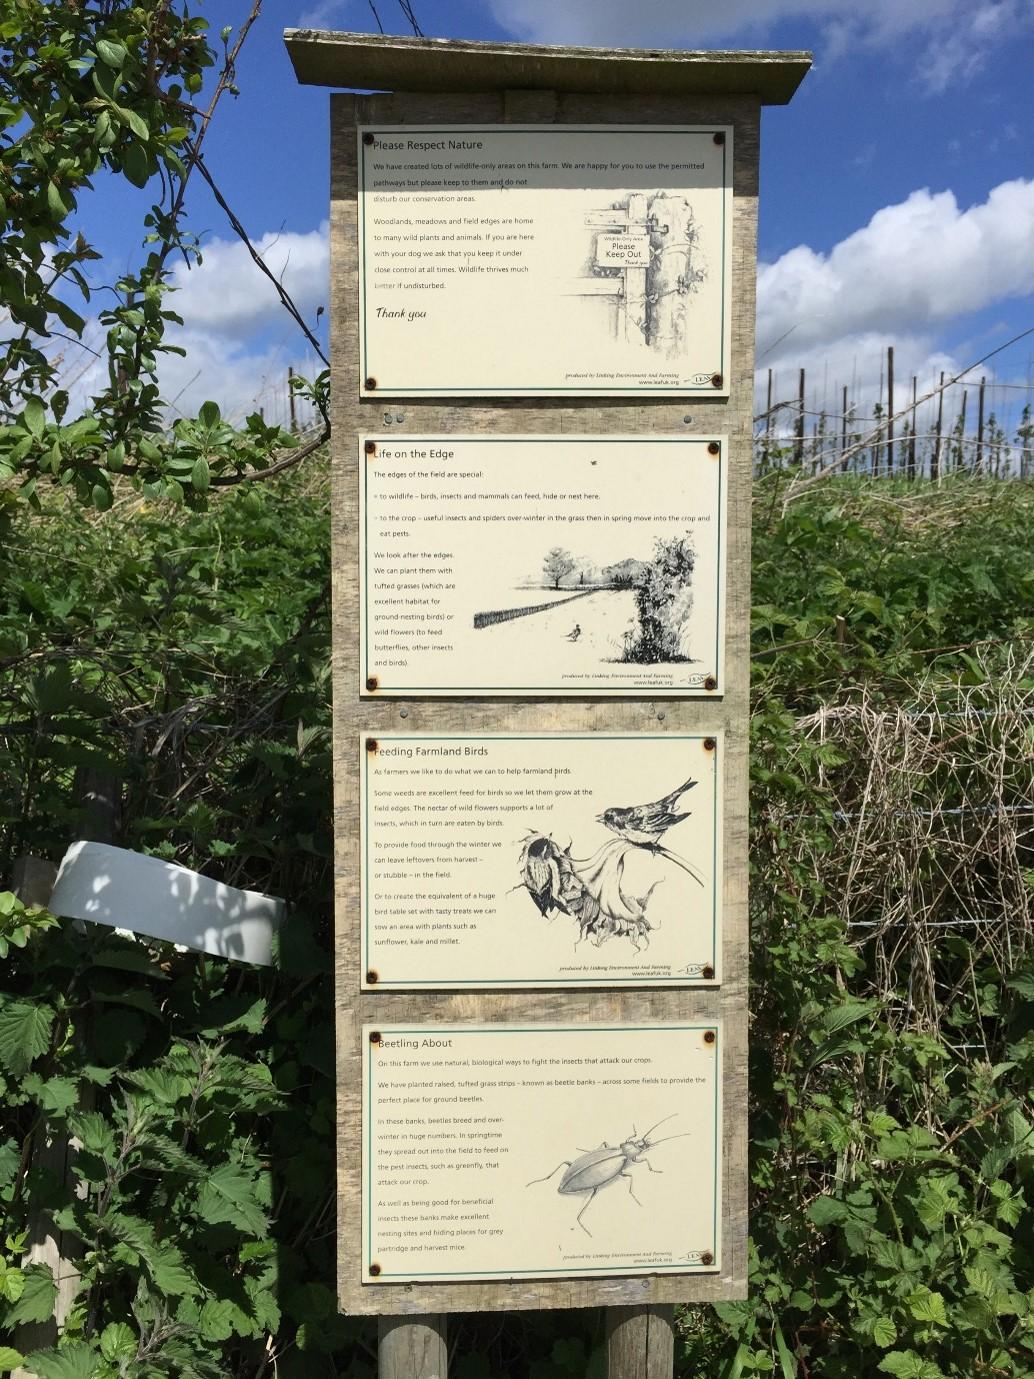 wildlife sign in woodlands showing bird and bug species